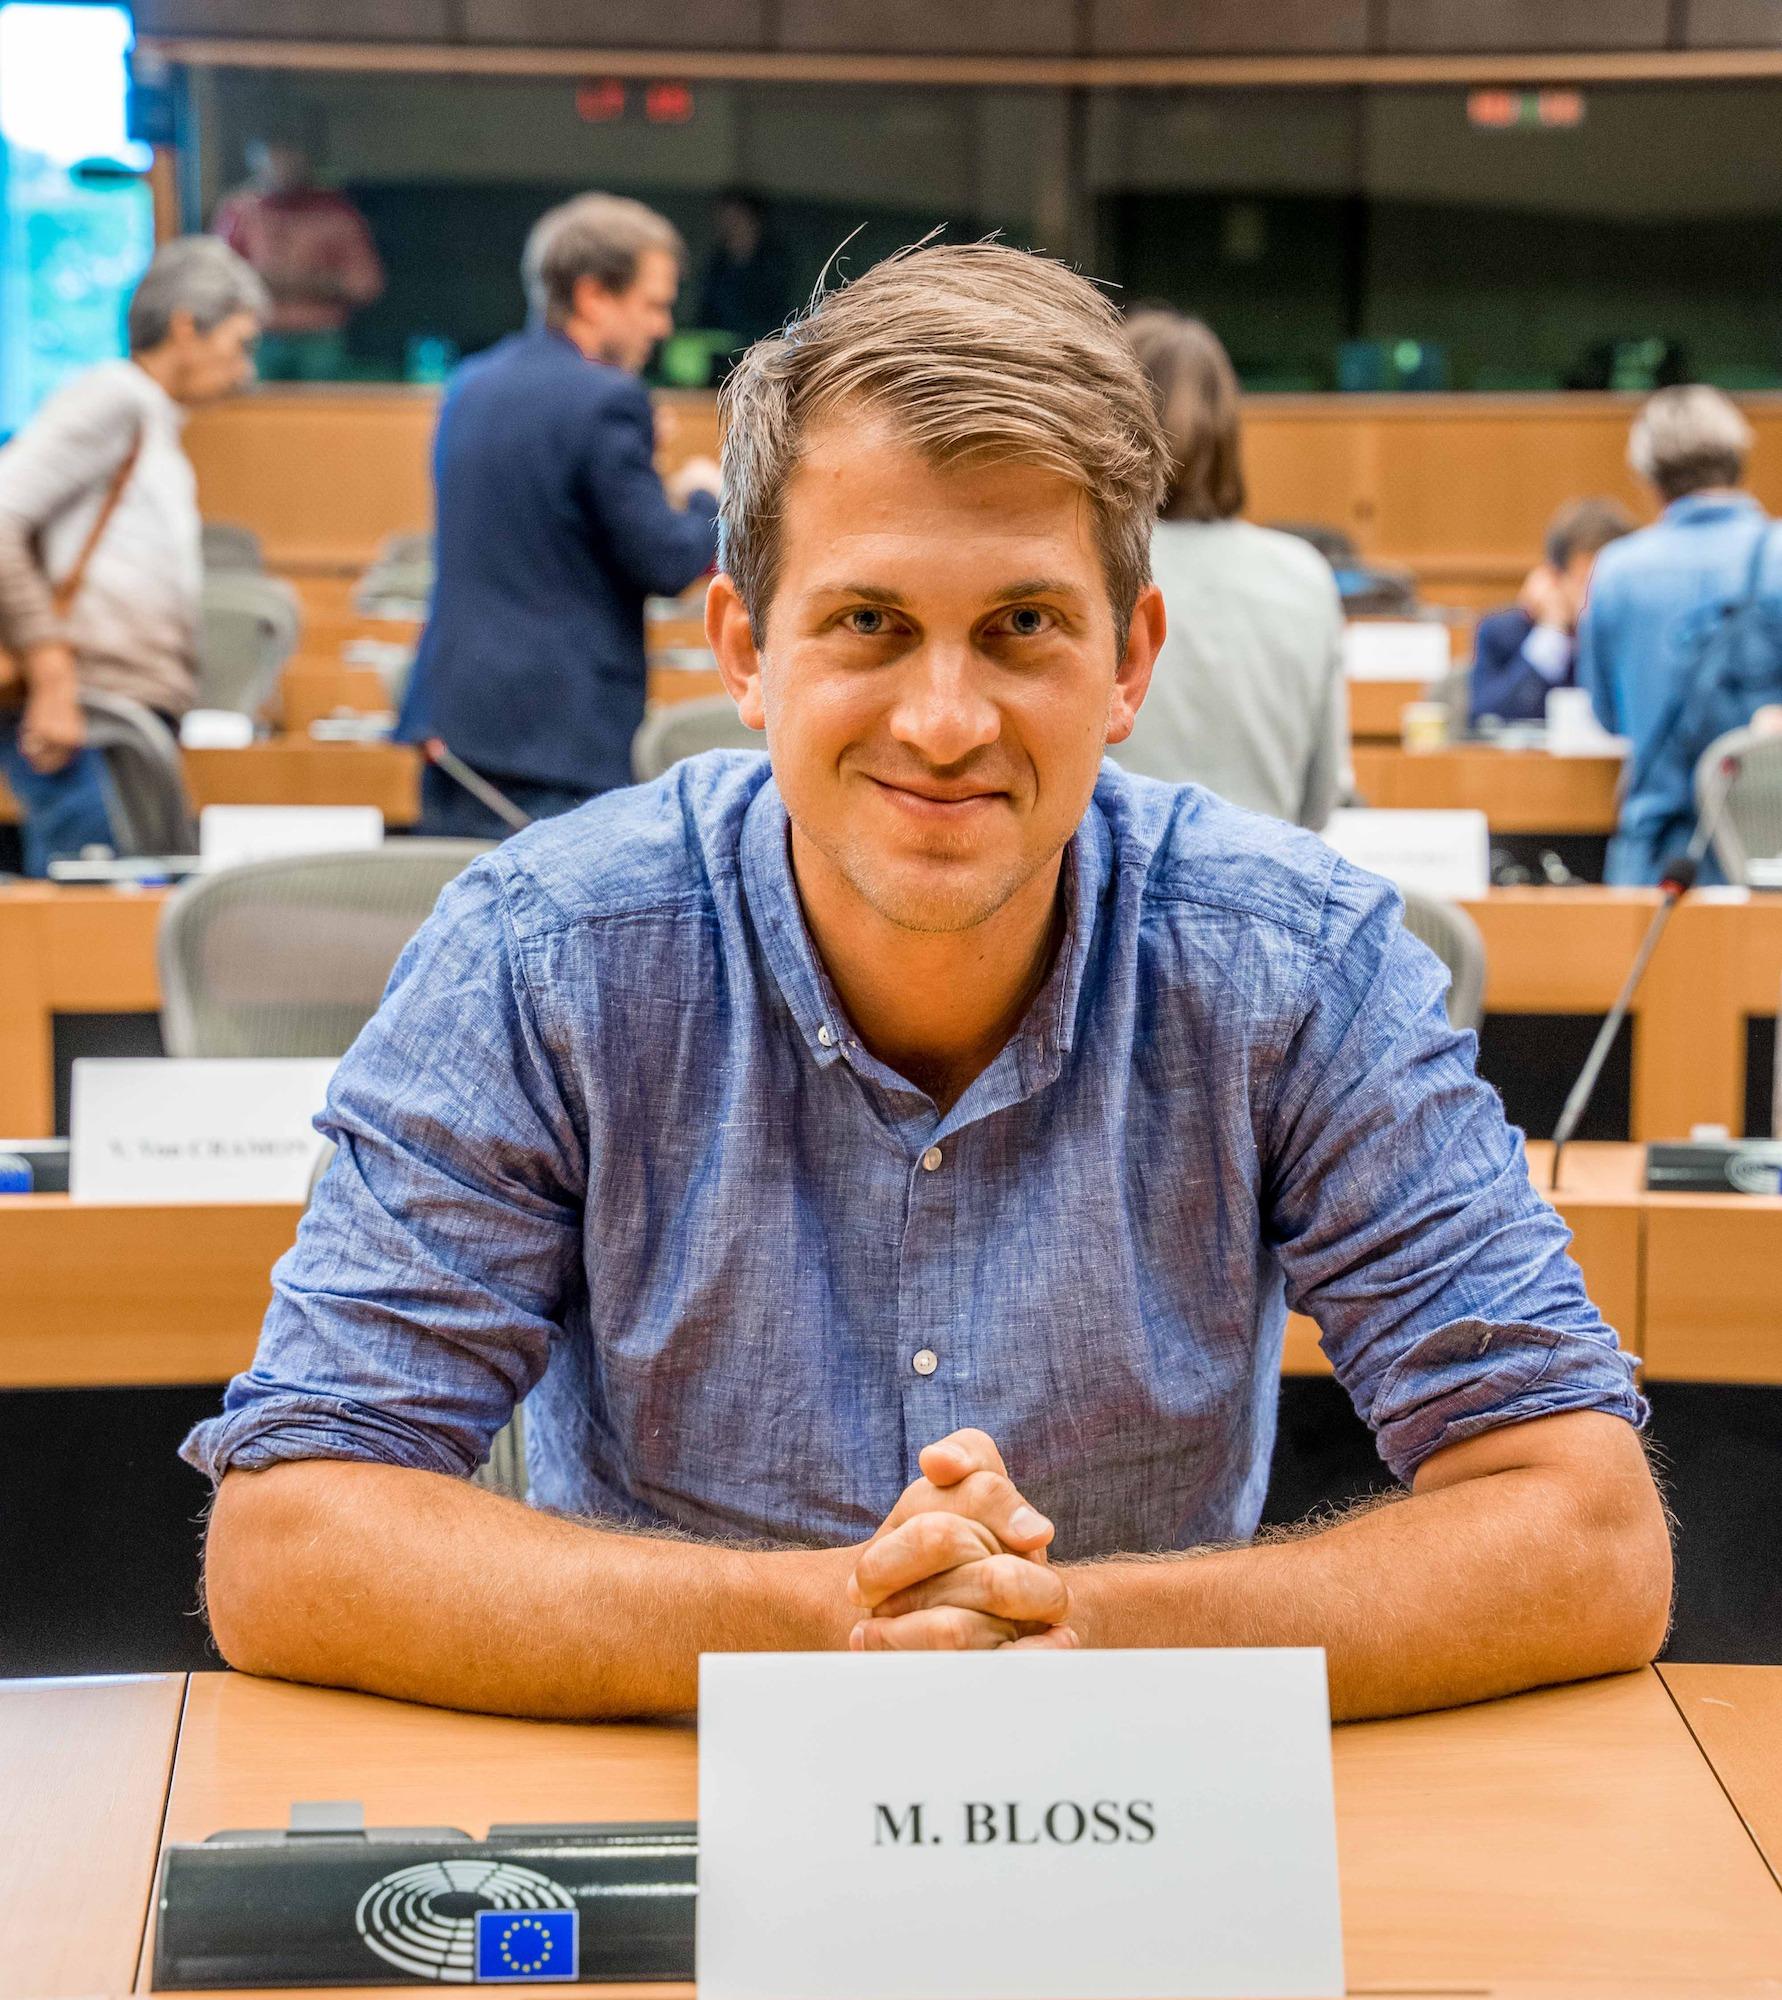 Europa-Politik im Netz – interaktiv mit Micha Bloss MdEP